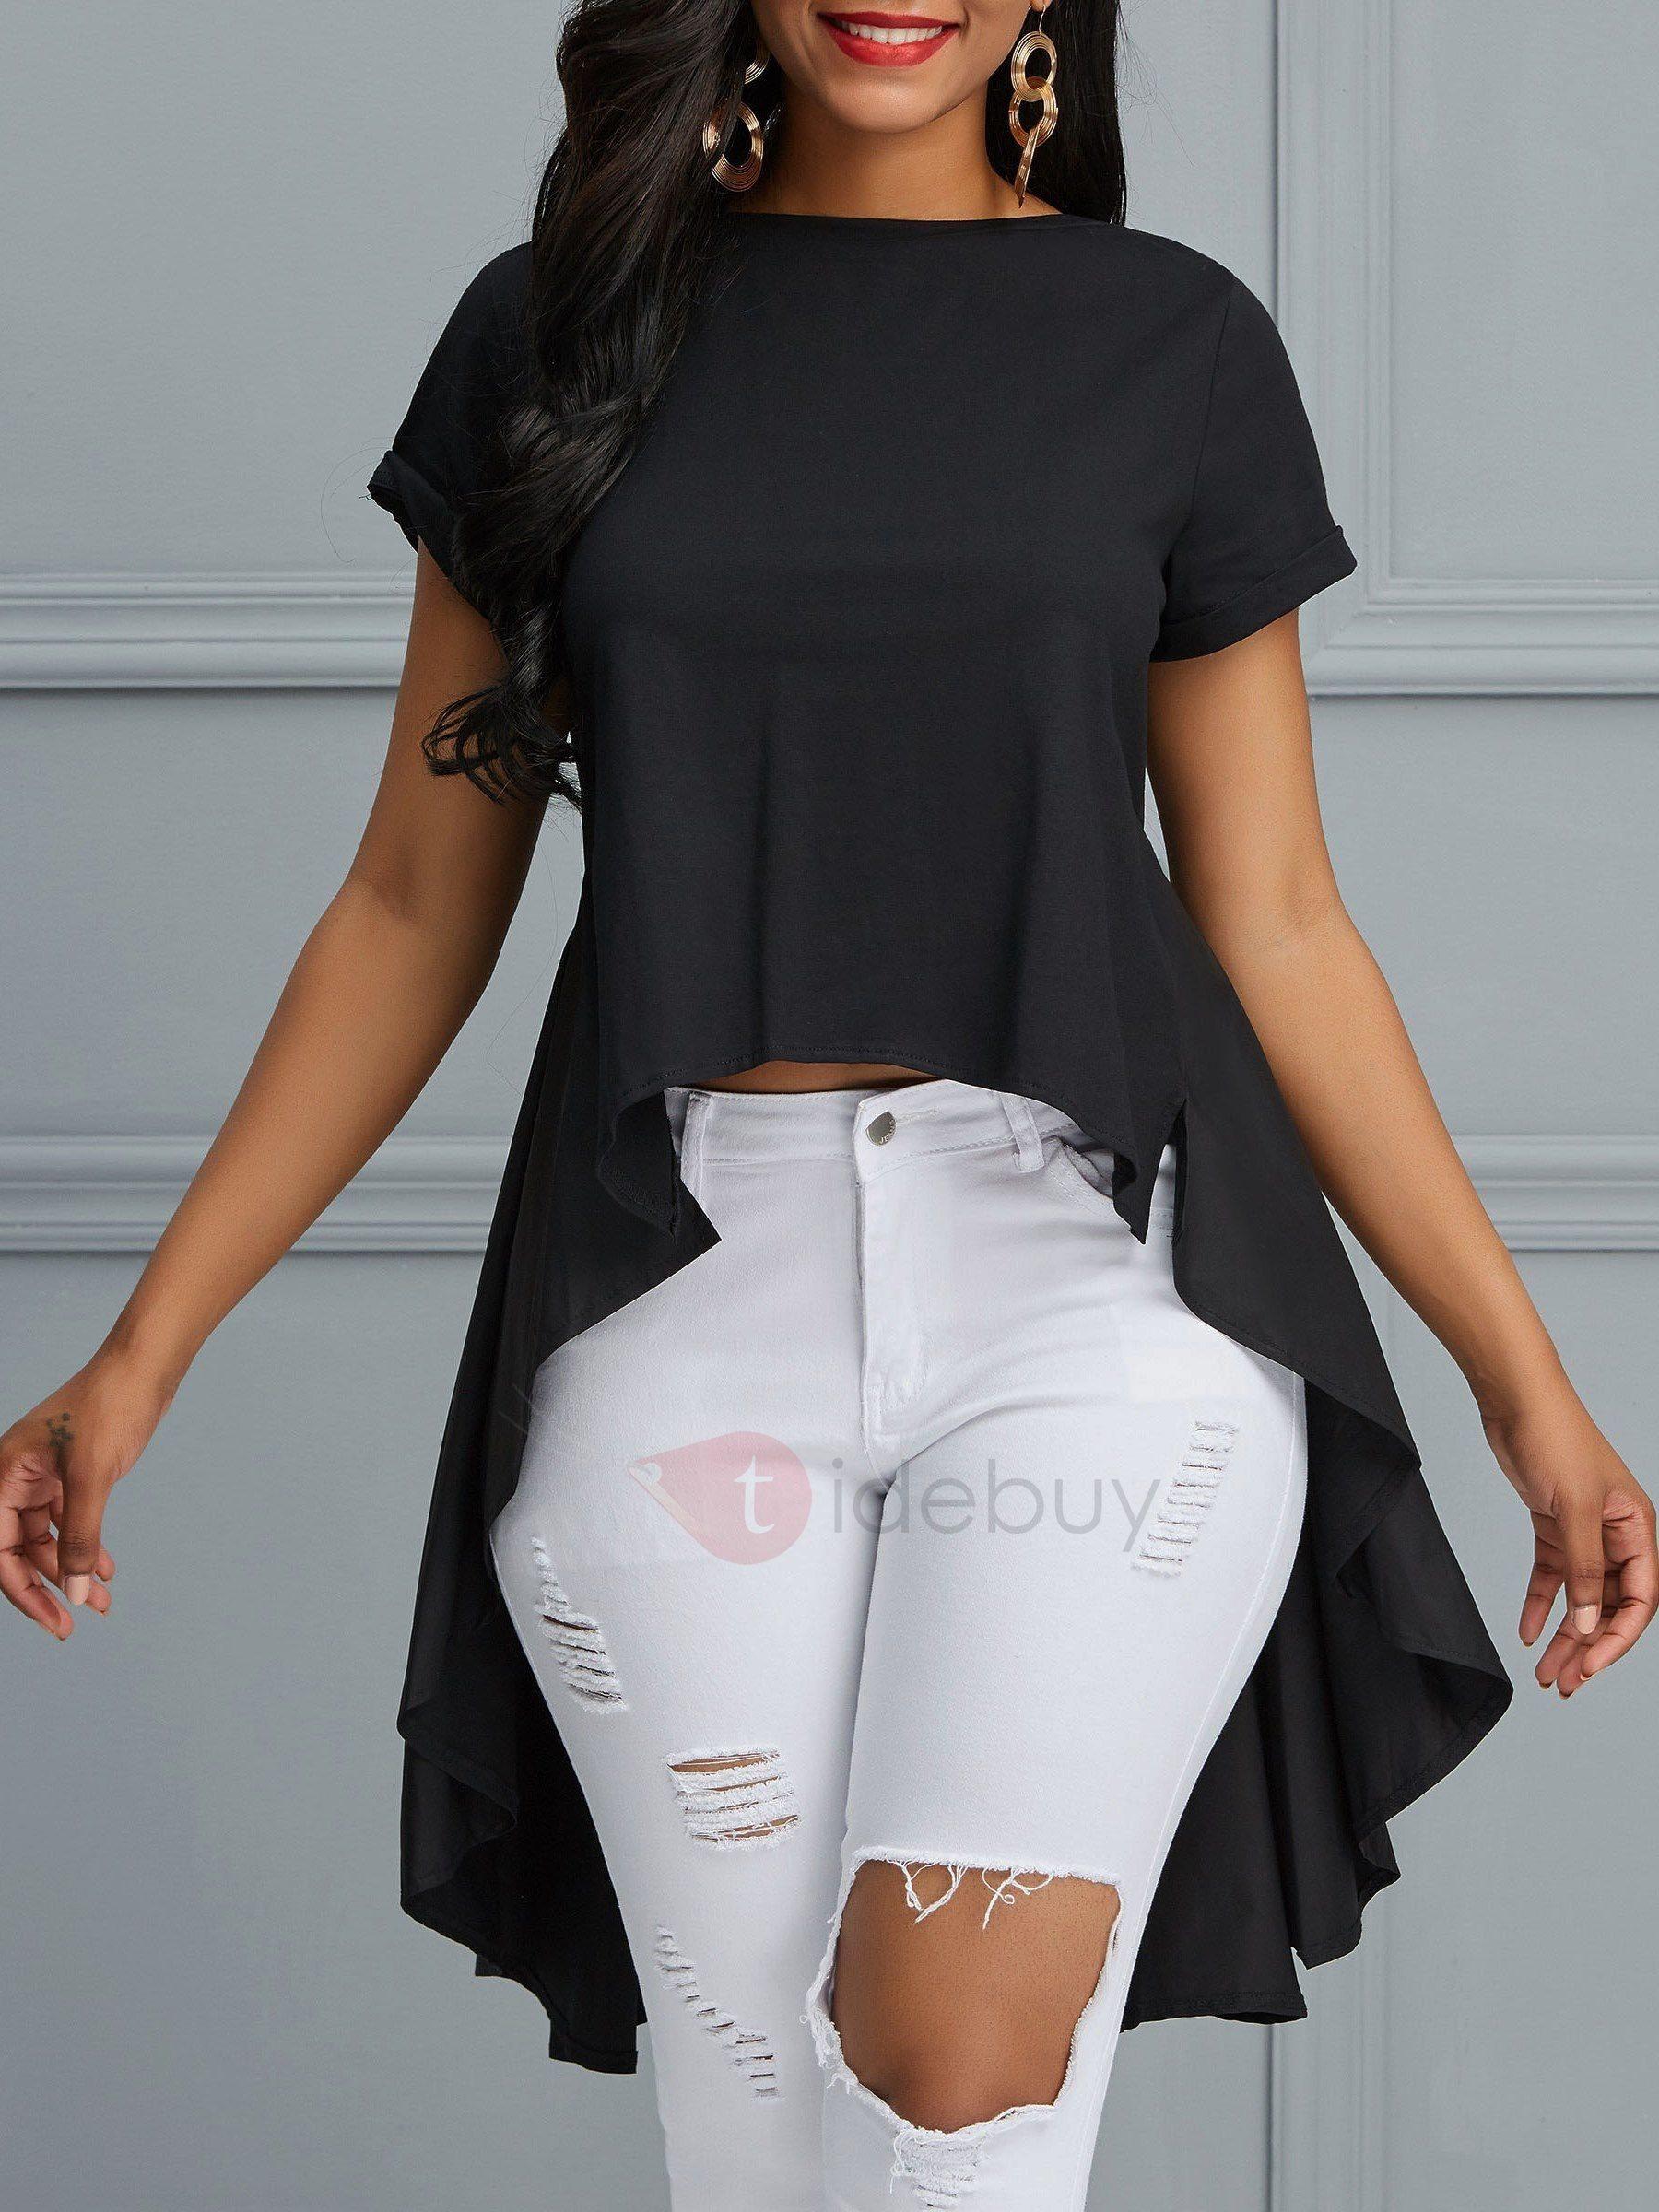 9db64d9c #AdoreWe #TideBuy - #TideBuy Asymmetric Peplum Plain Mid-Length Womens T- Shirt - AdoreWe.com